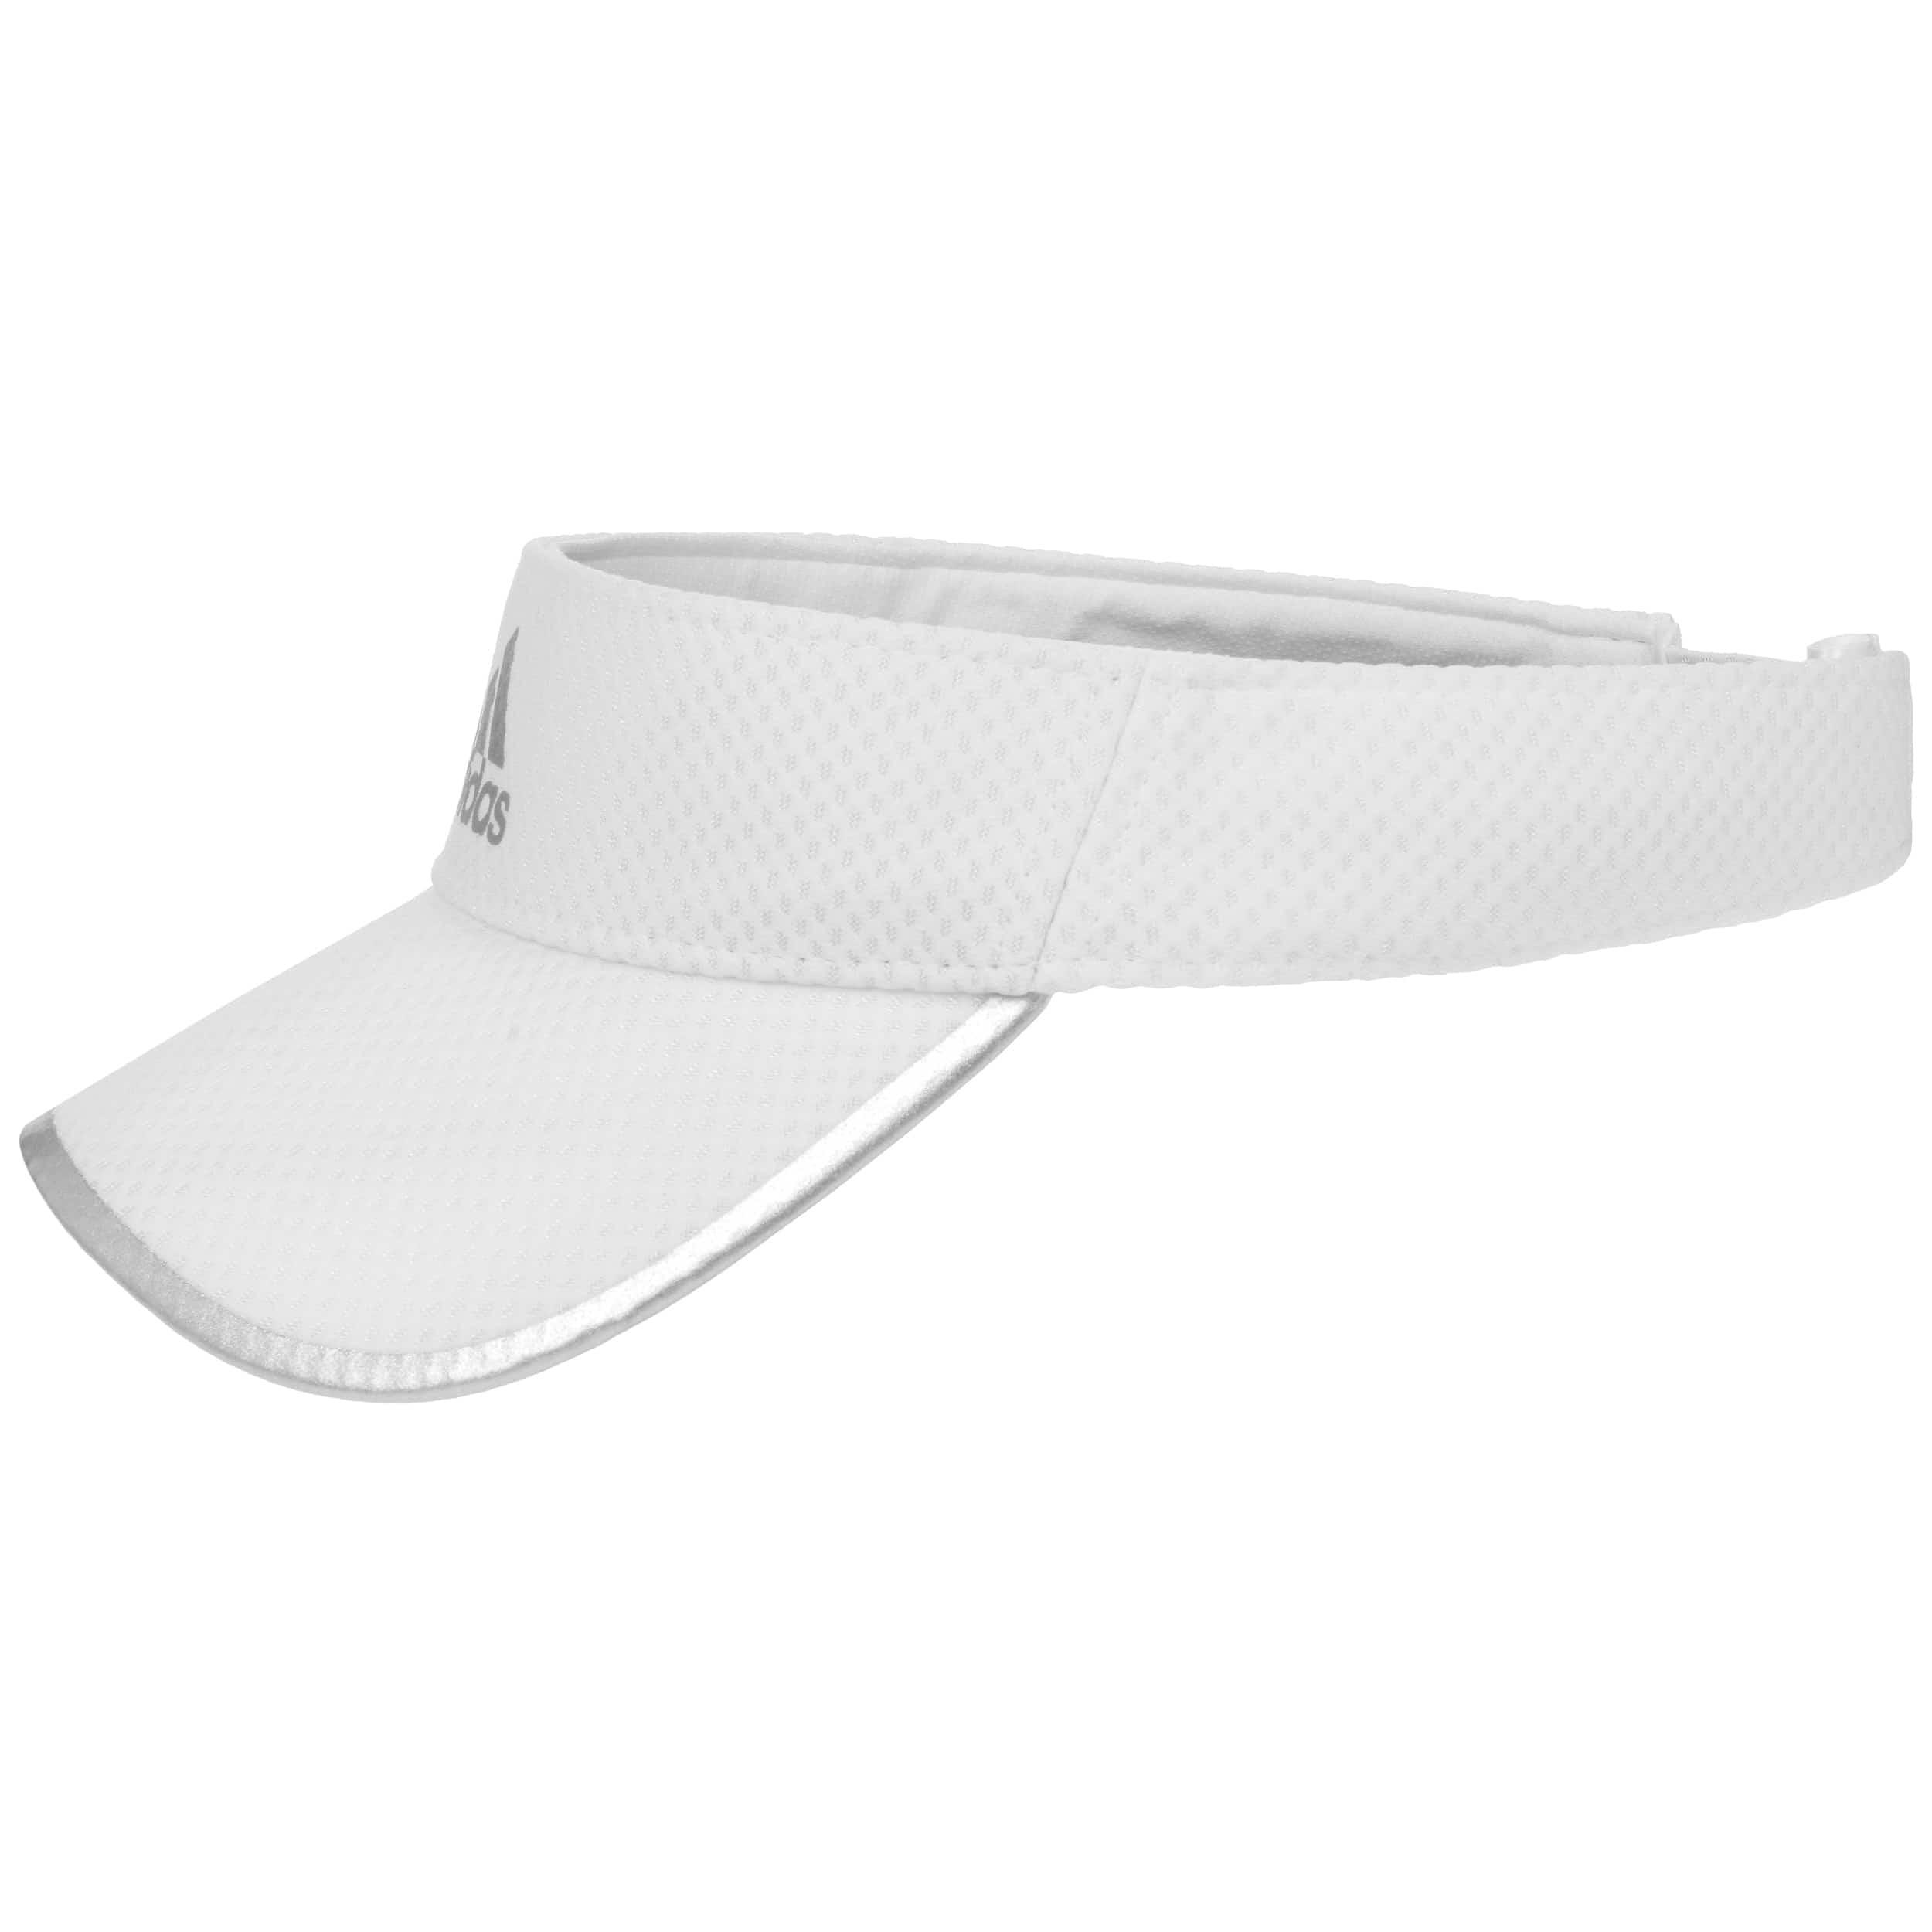 e56ad0e1 R96 Climacool Visor by adidas, GBP 18,95 --> Hats, caps & beanies ...